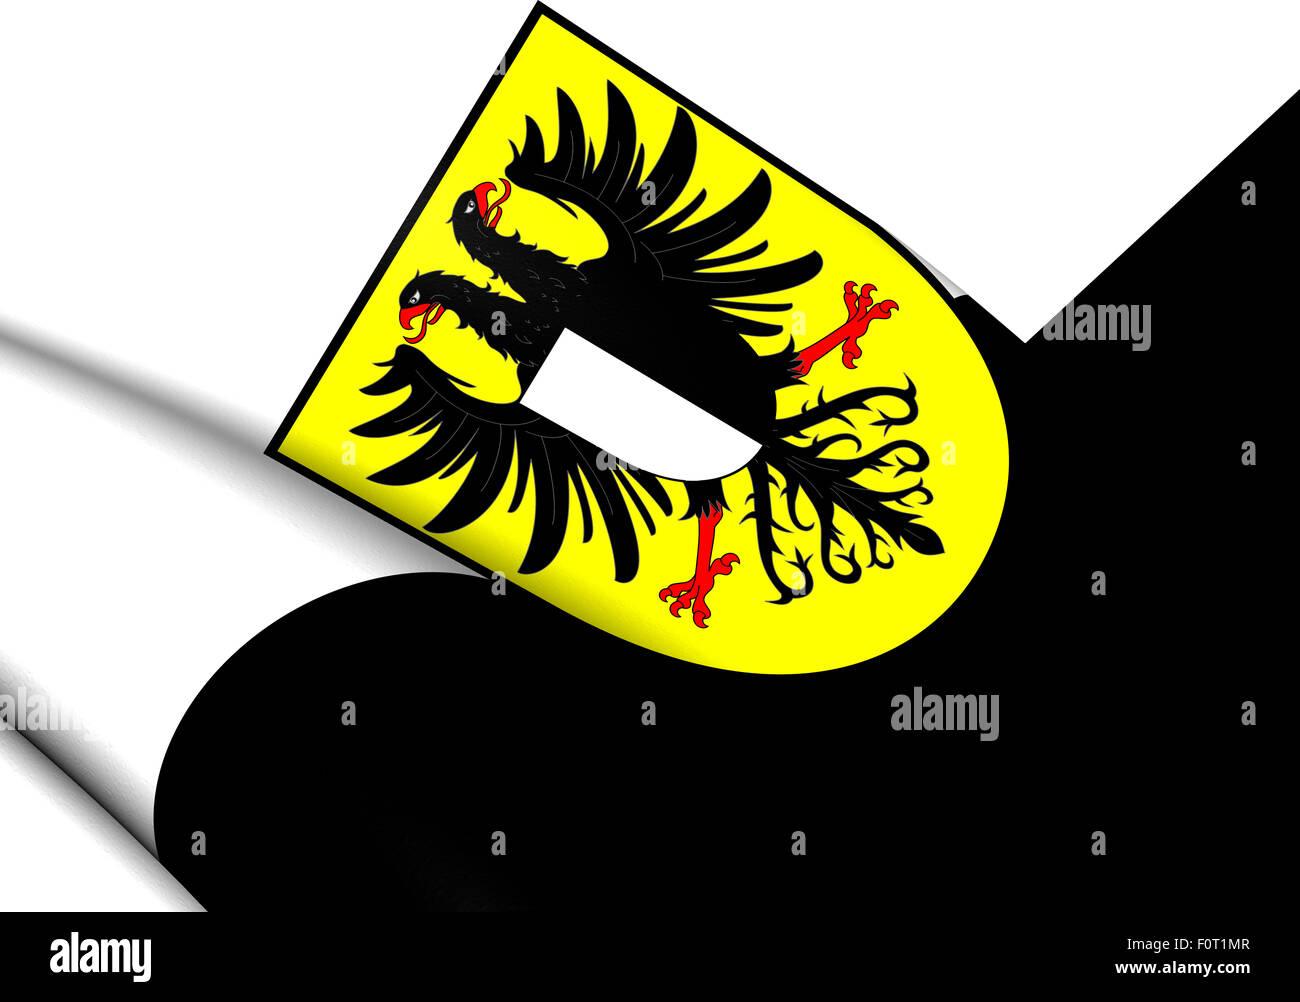 3D Bandera de Friedberg (Friedberg in der Wetterau), Alemania. Cerca. Foto de stock